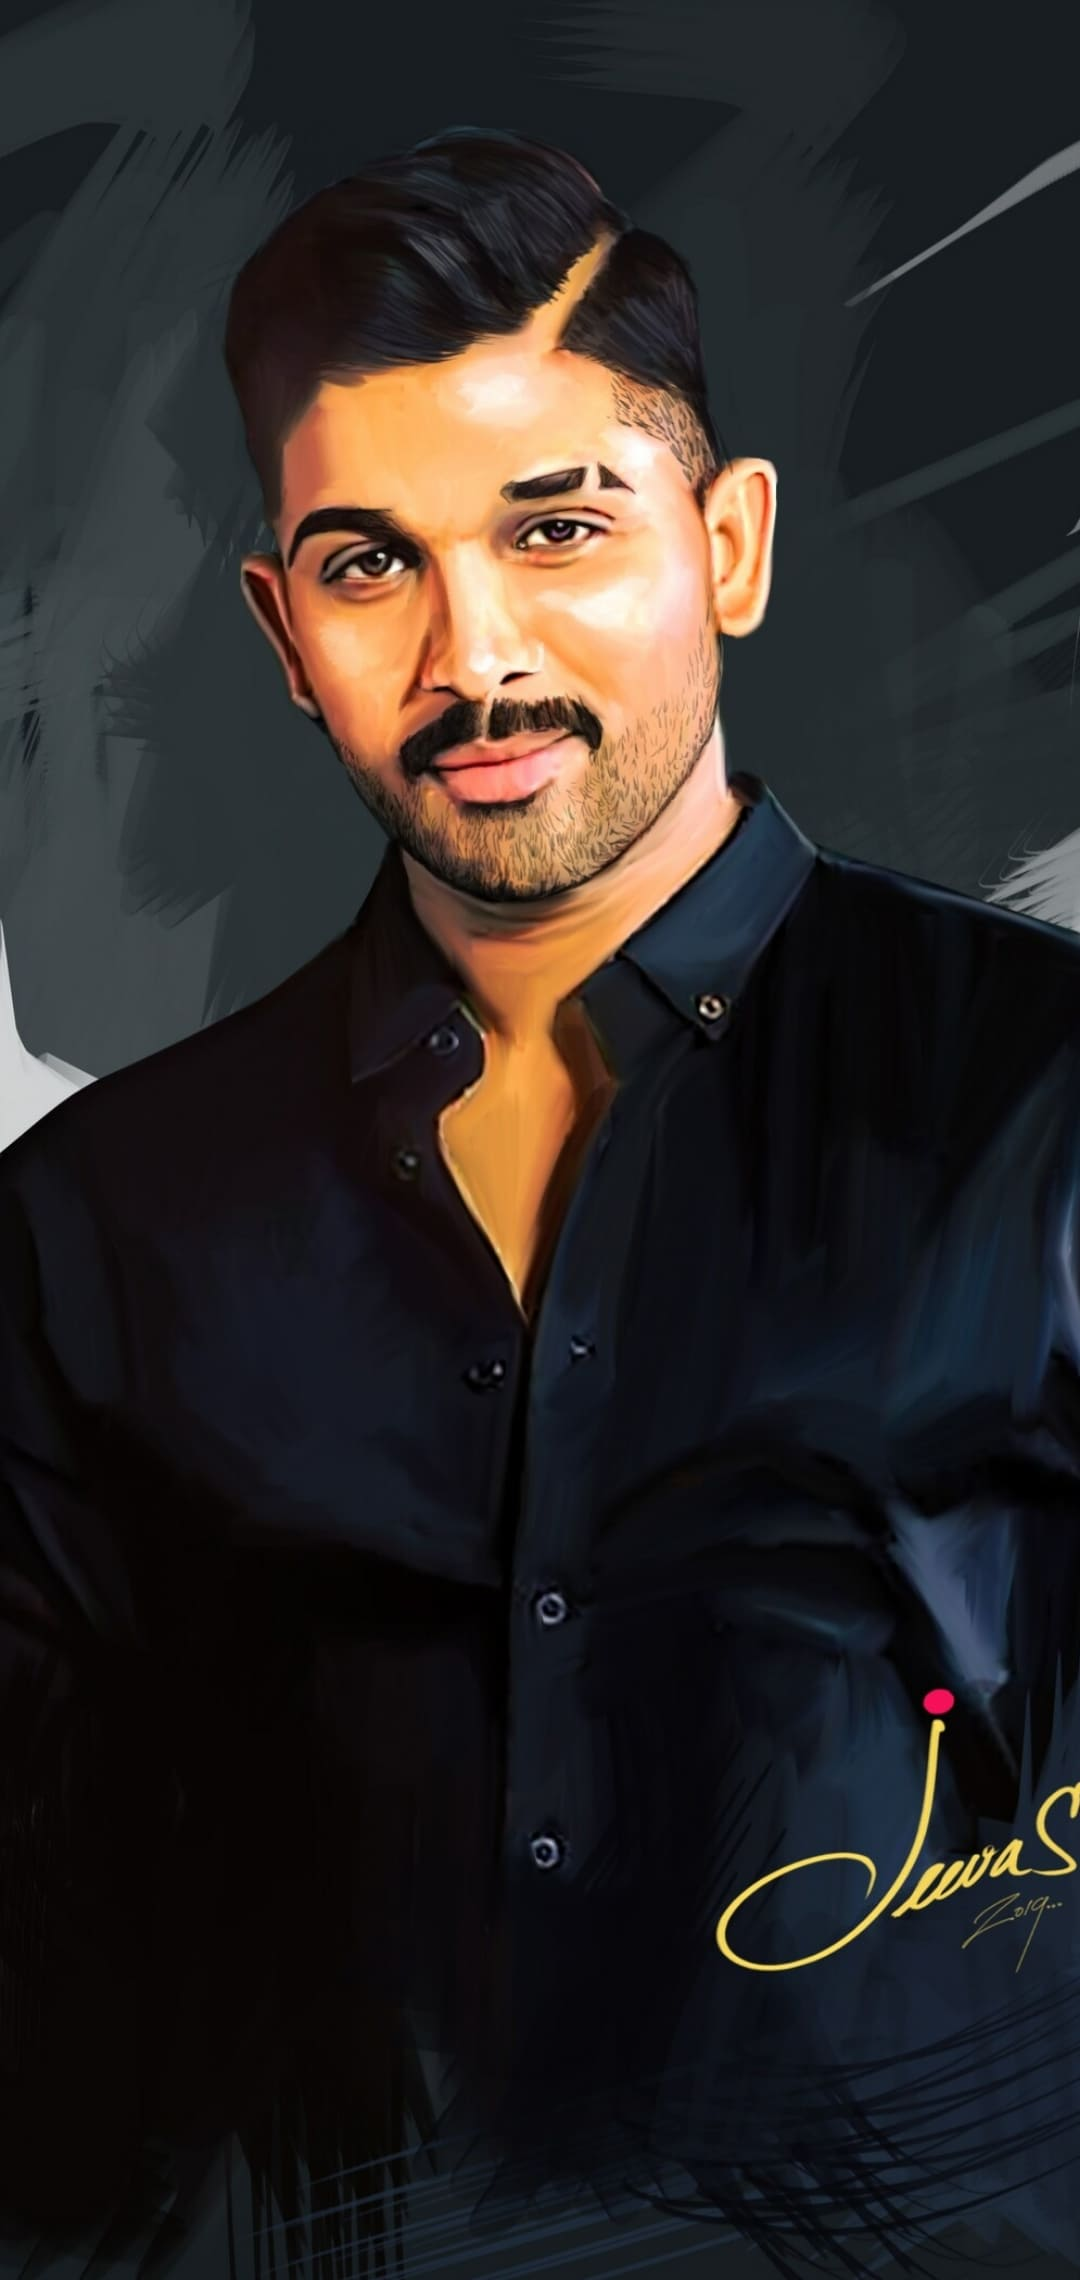 Allu Arjun Wallpapers   Top 9 Best Allu Arjun Backgrounds Download